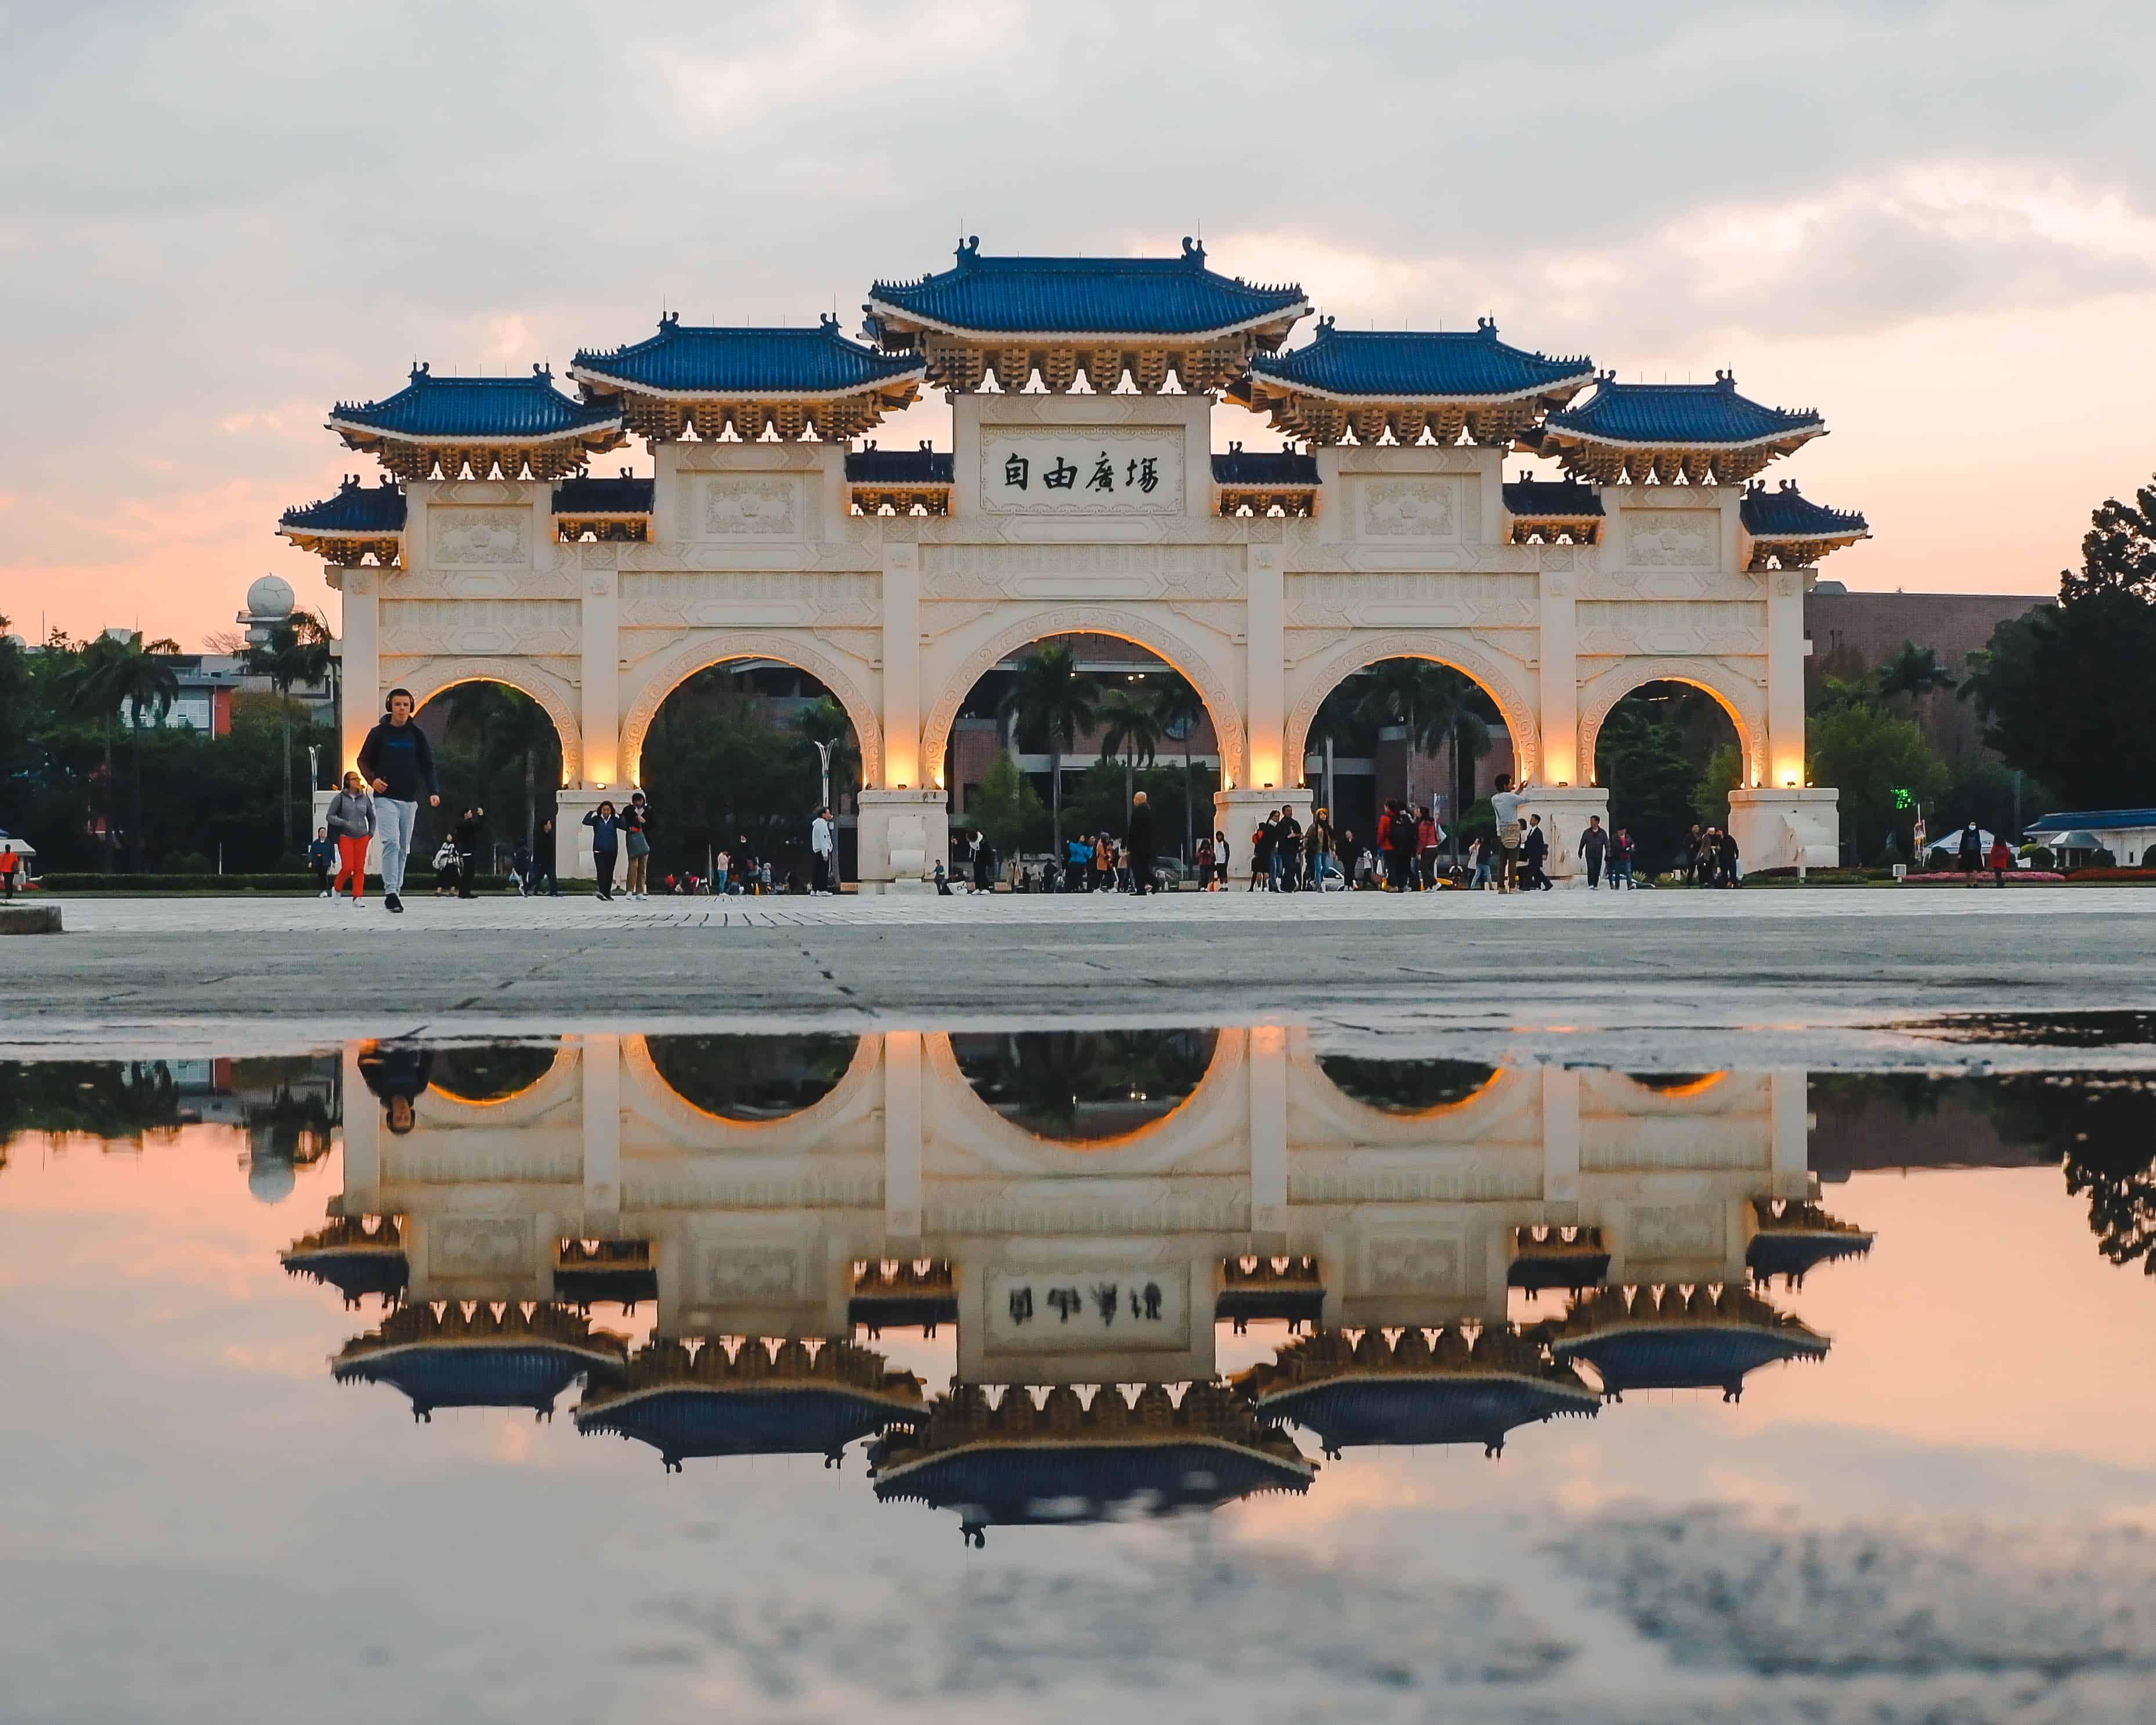 chiang_kai_shek_5-day taiwan itinerary